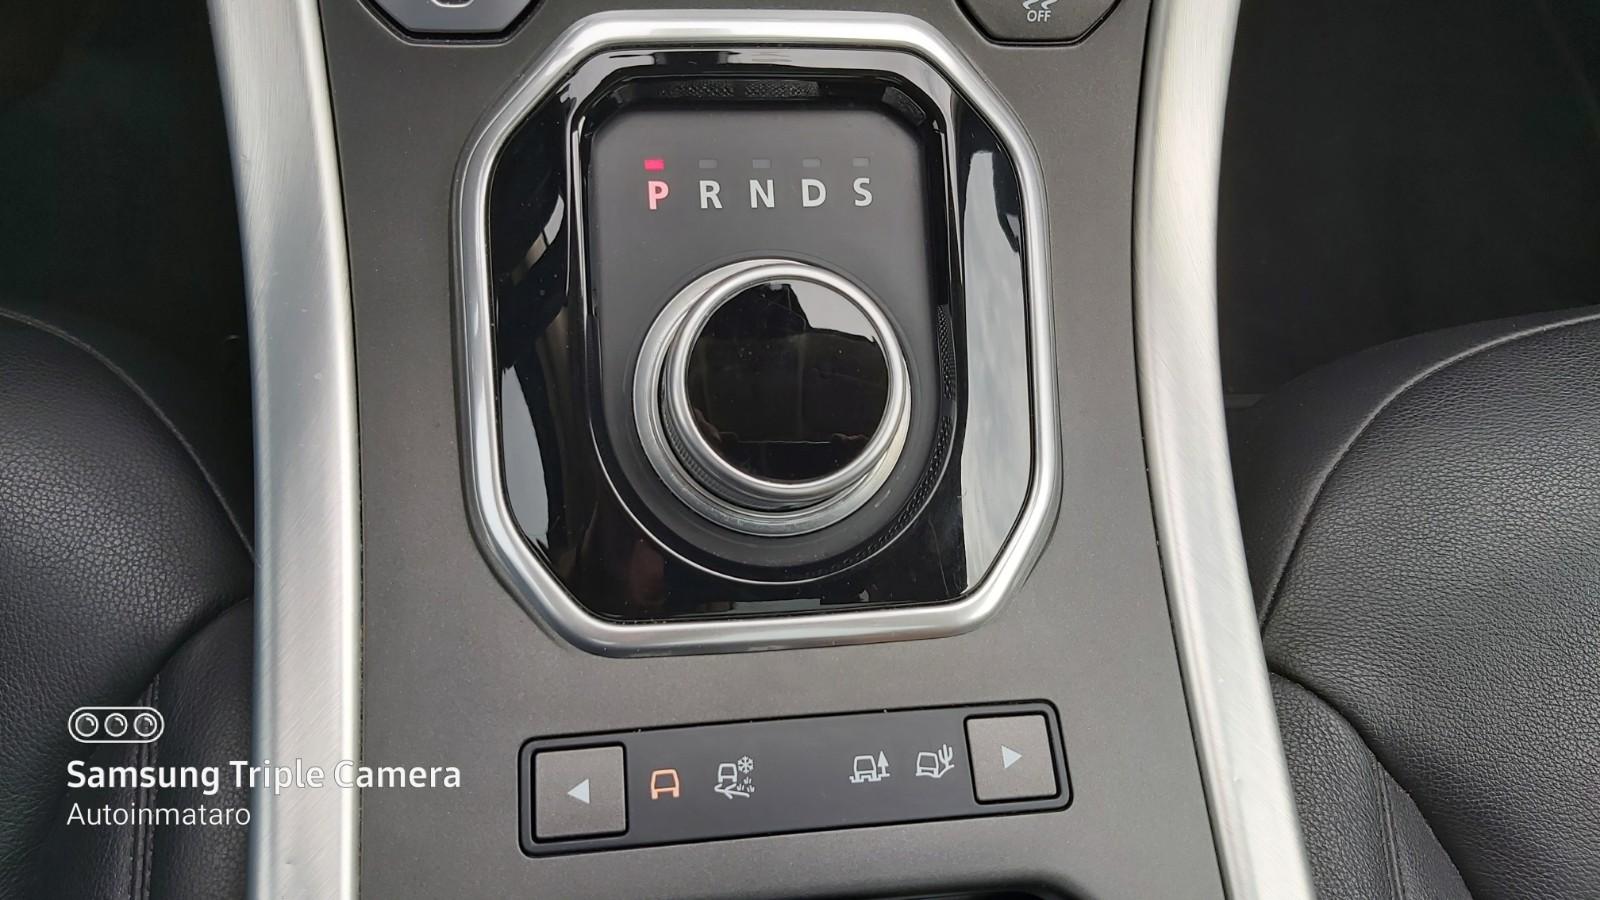 Range Rover Evoque 2.0L TD4 110kW 4×4 SE Dynamic Auto